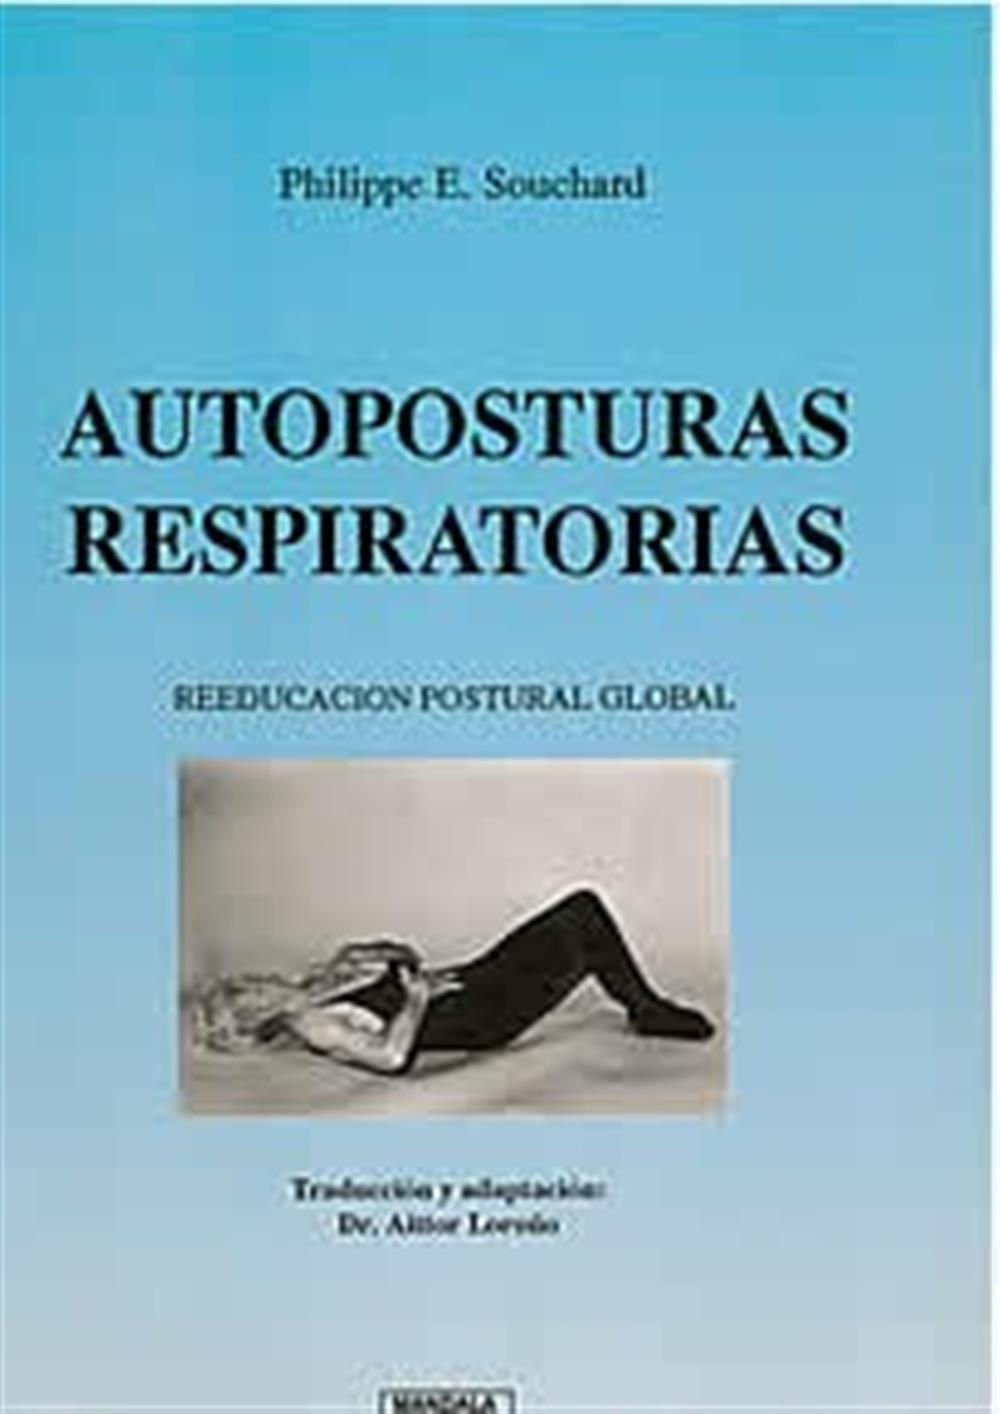 Autoposturas respiratorias